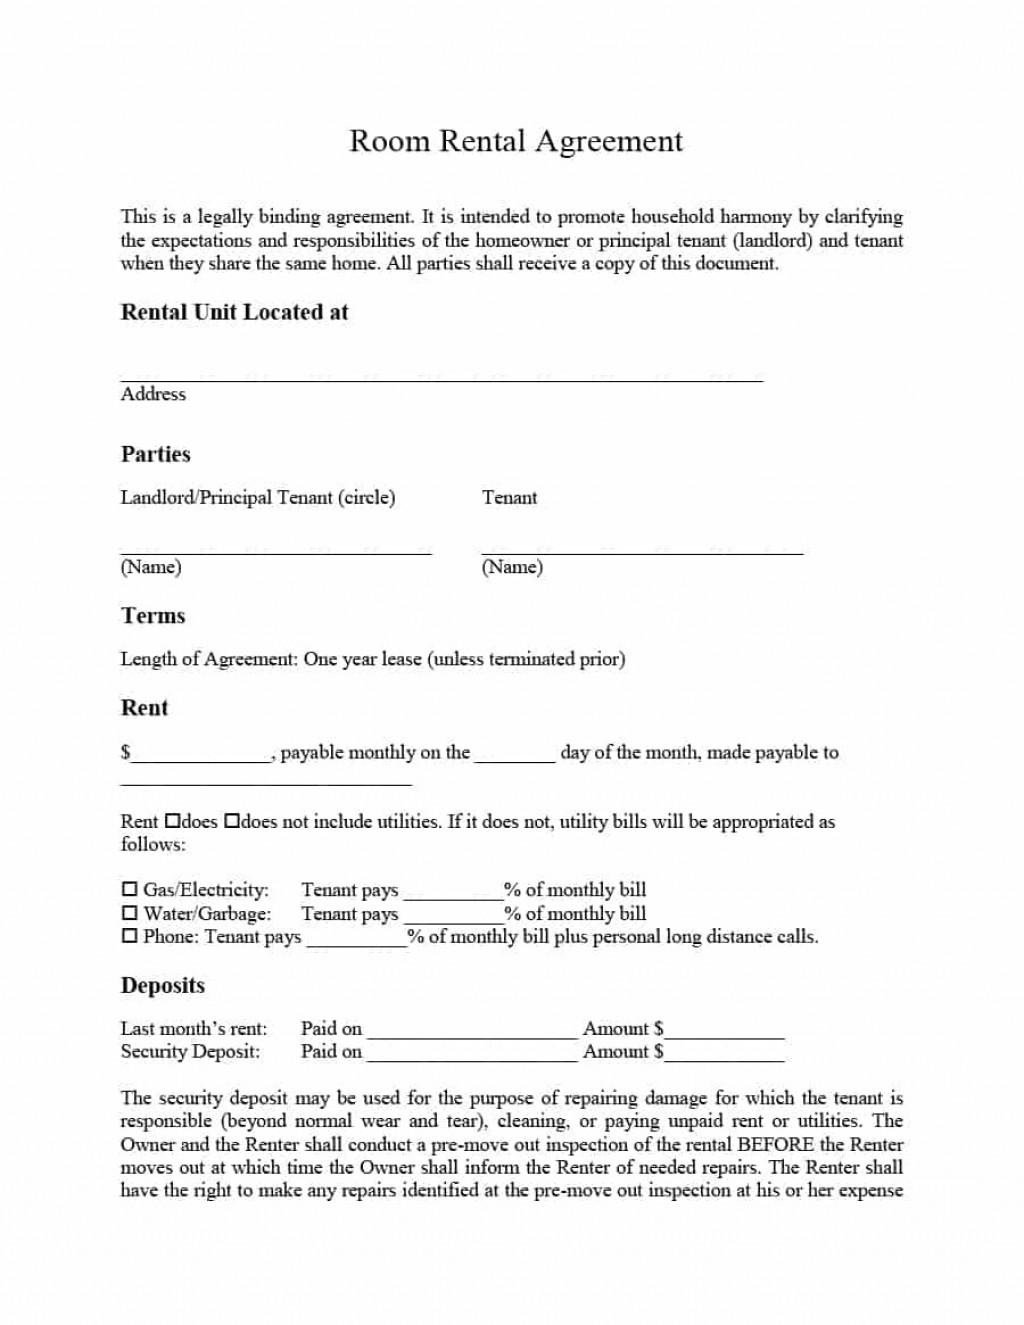 Room Rental Agreement Template Idea  Word Doc Malaysia Singapore PdfLarge